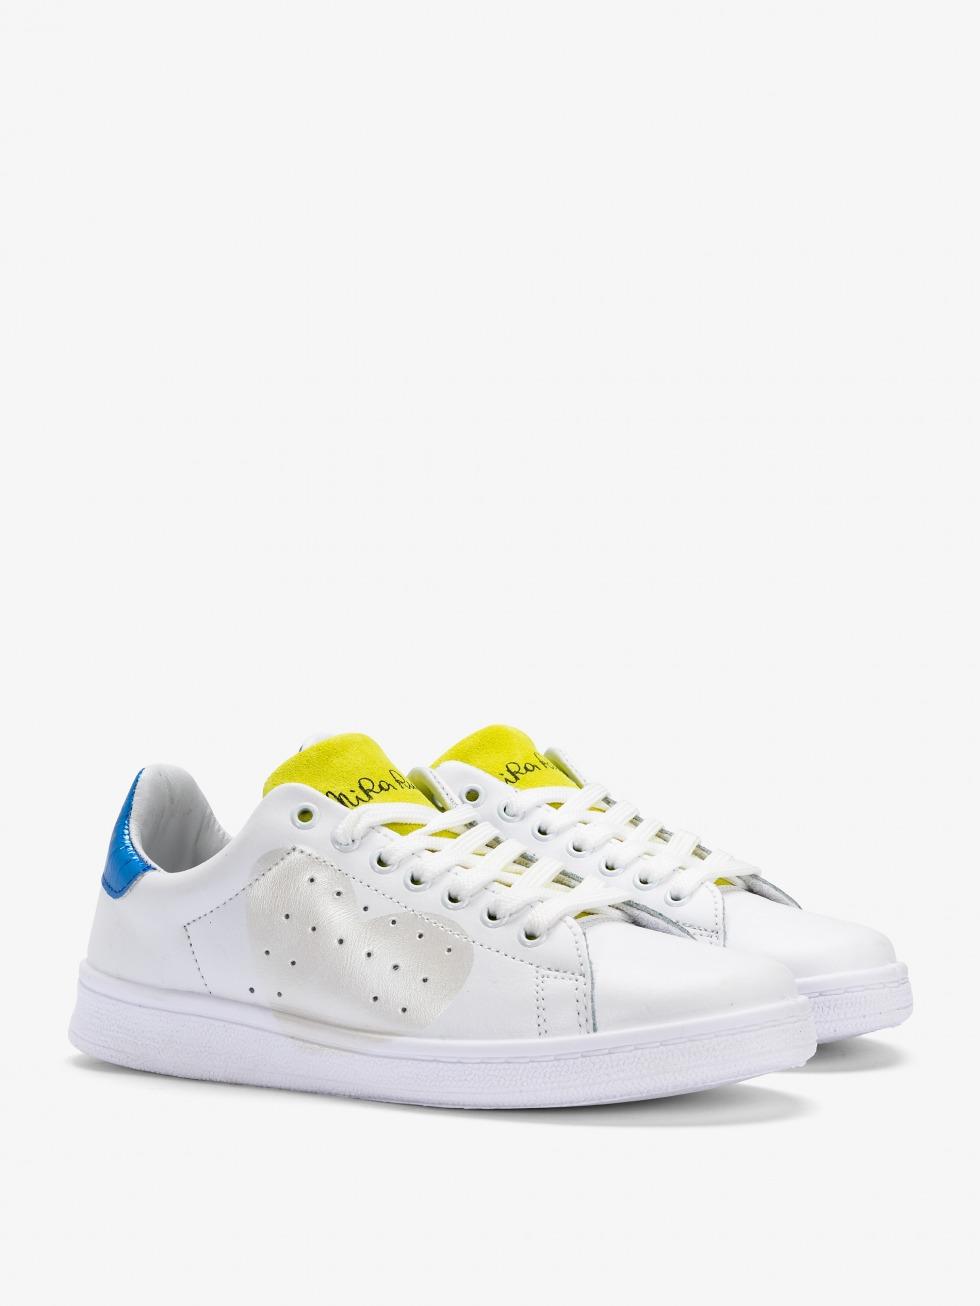 Daiquiri Sneakers - Space Electric Heart